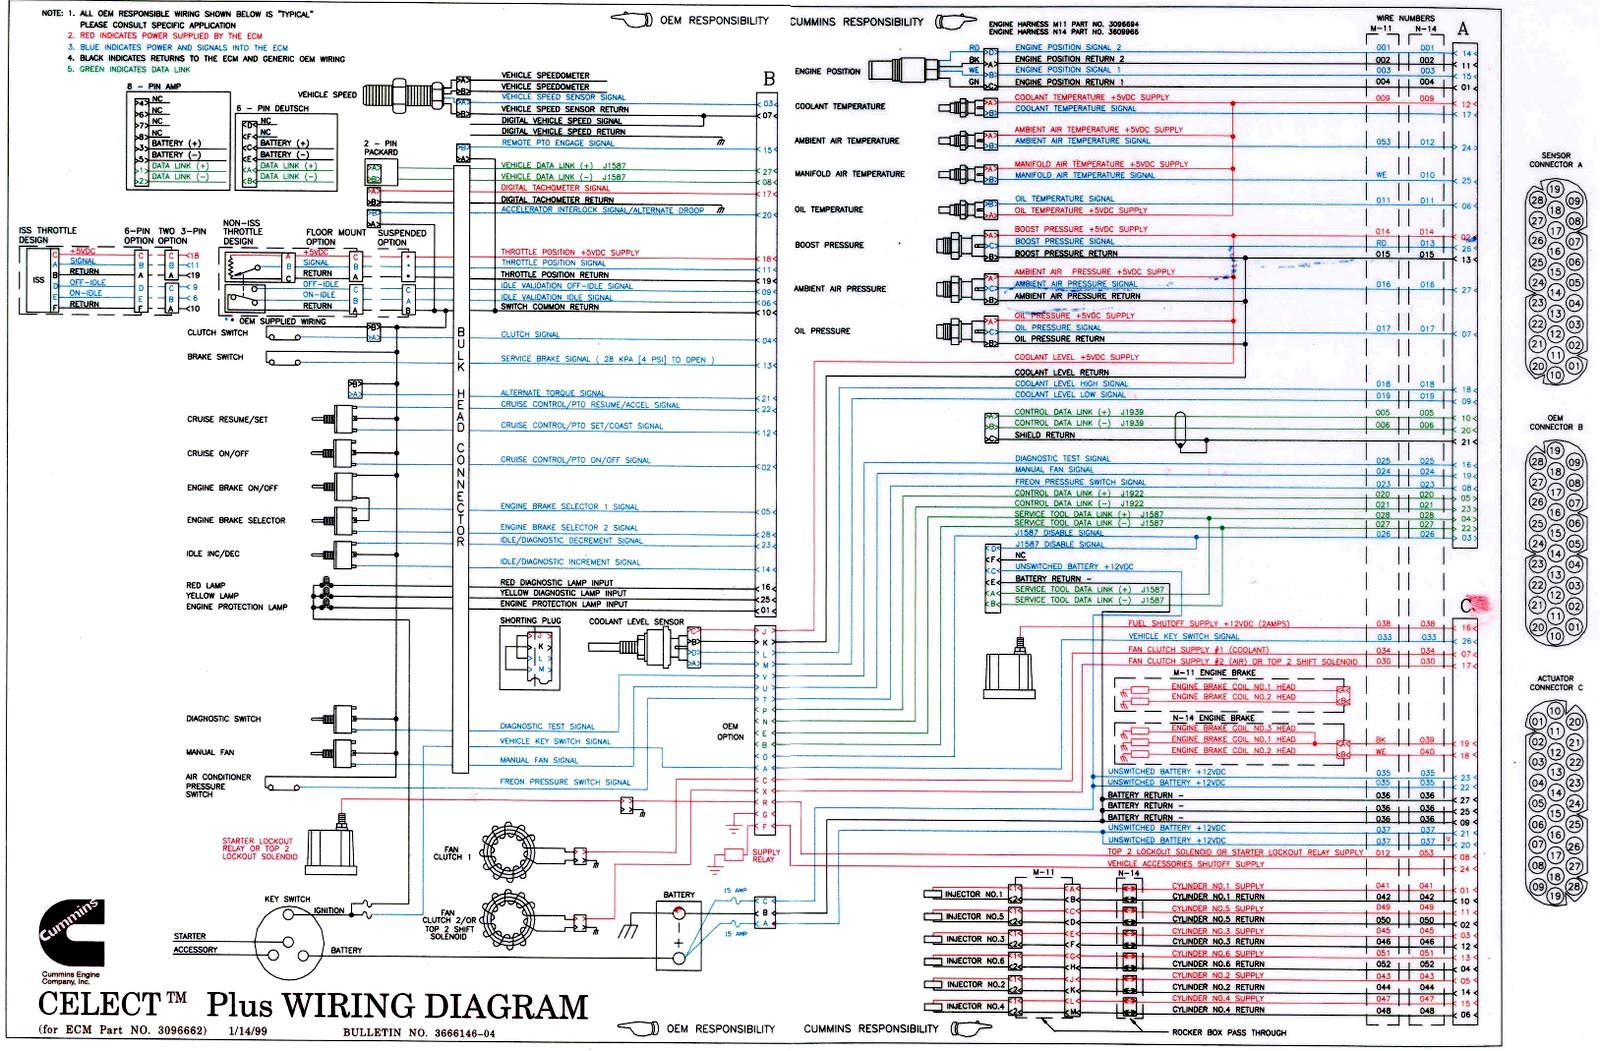 Paystar Wiring Diagram Experts 2000 Navistar Symbols Diagrams Extraordinary 5000